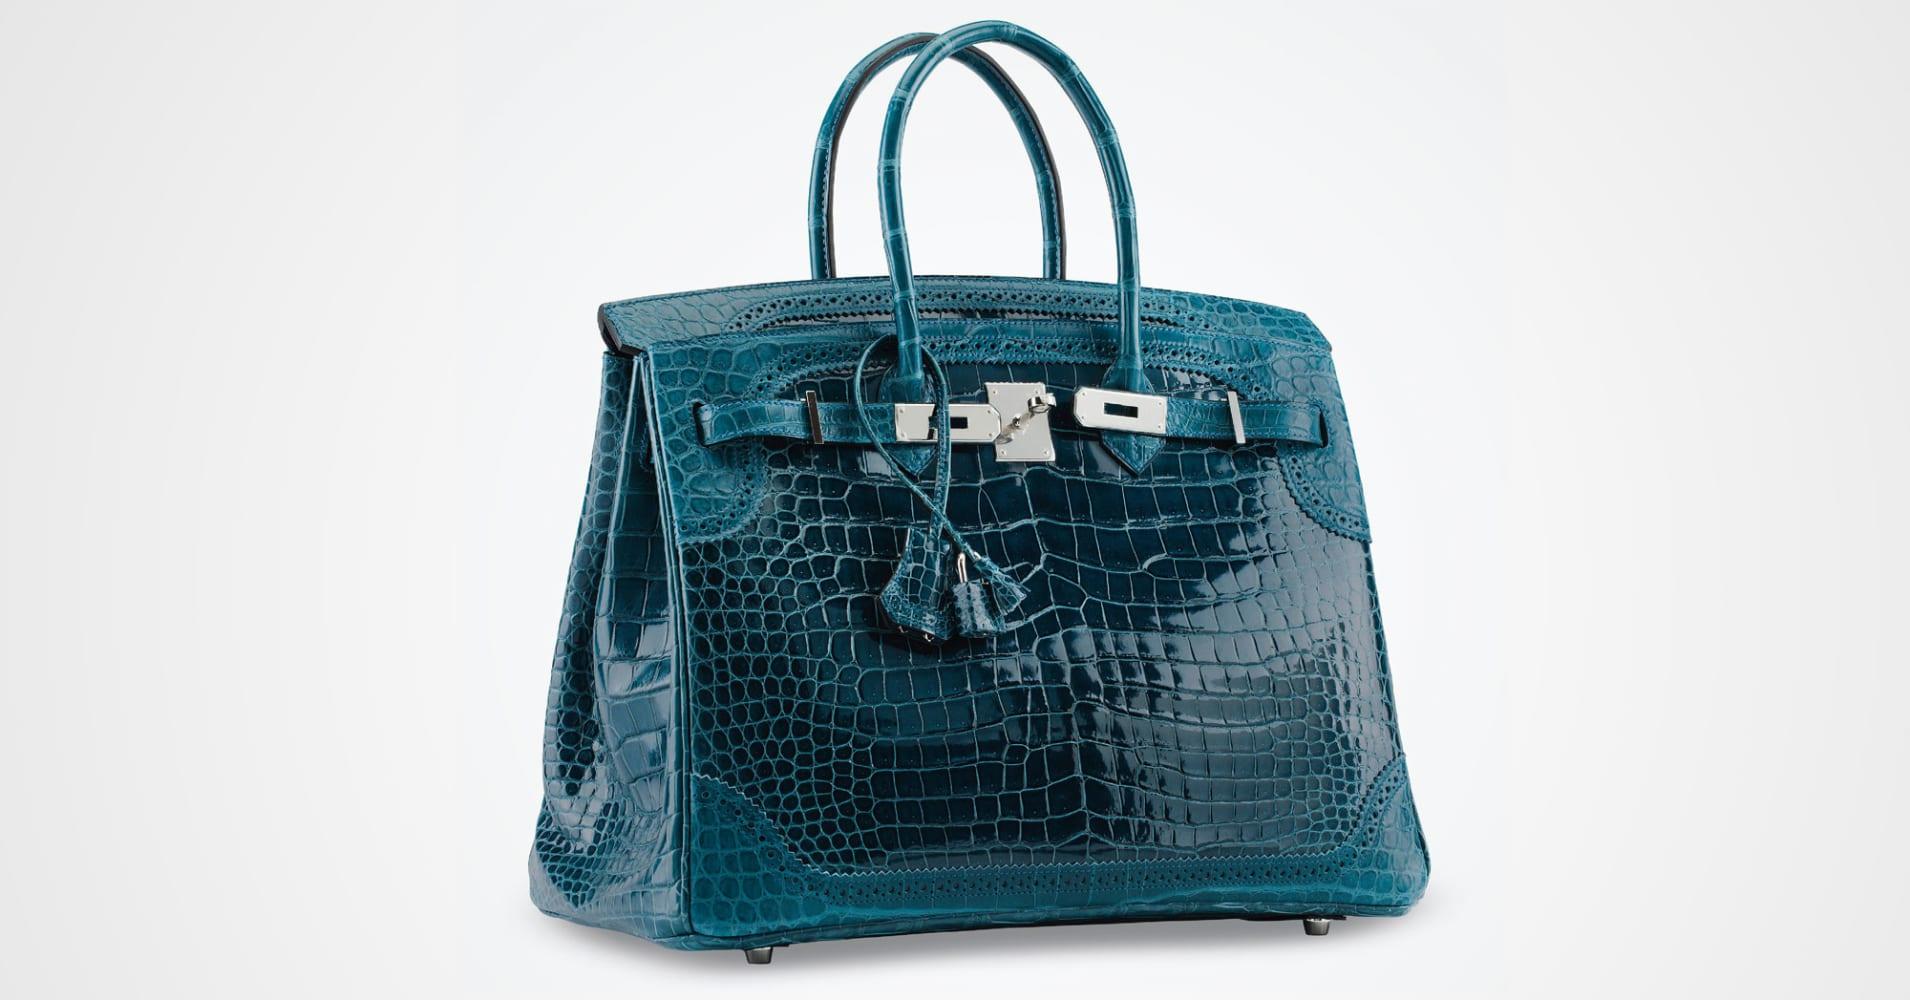 d47f10f7f8c1 france hermes handbag turquoise quotes 34142 3144b